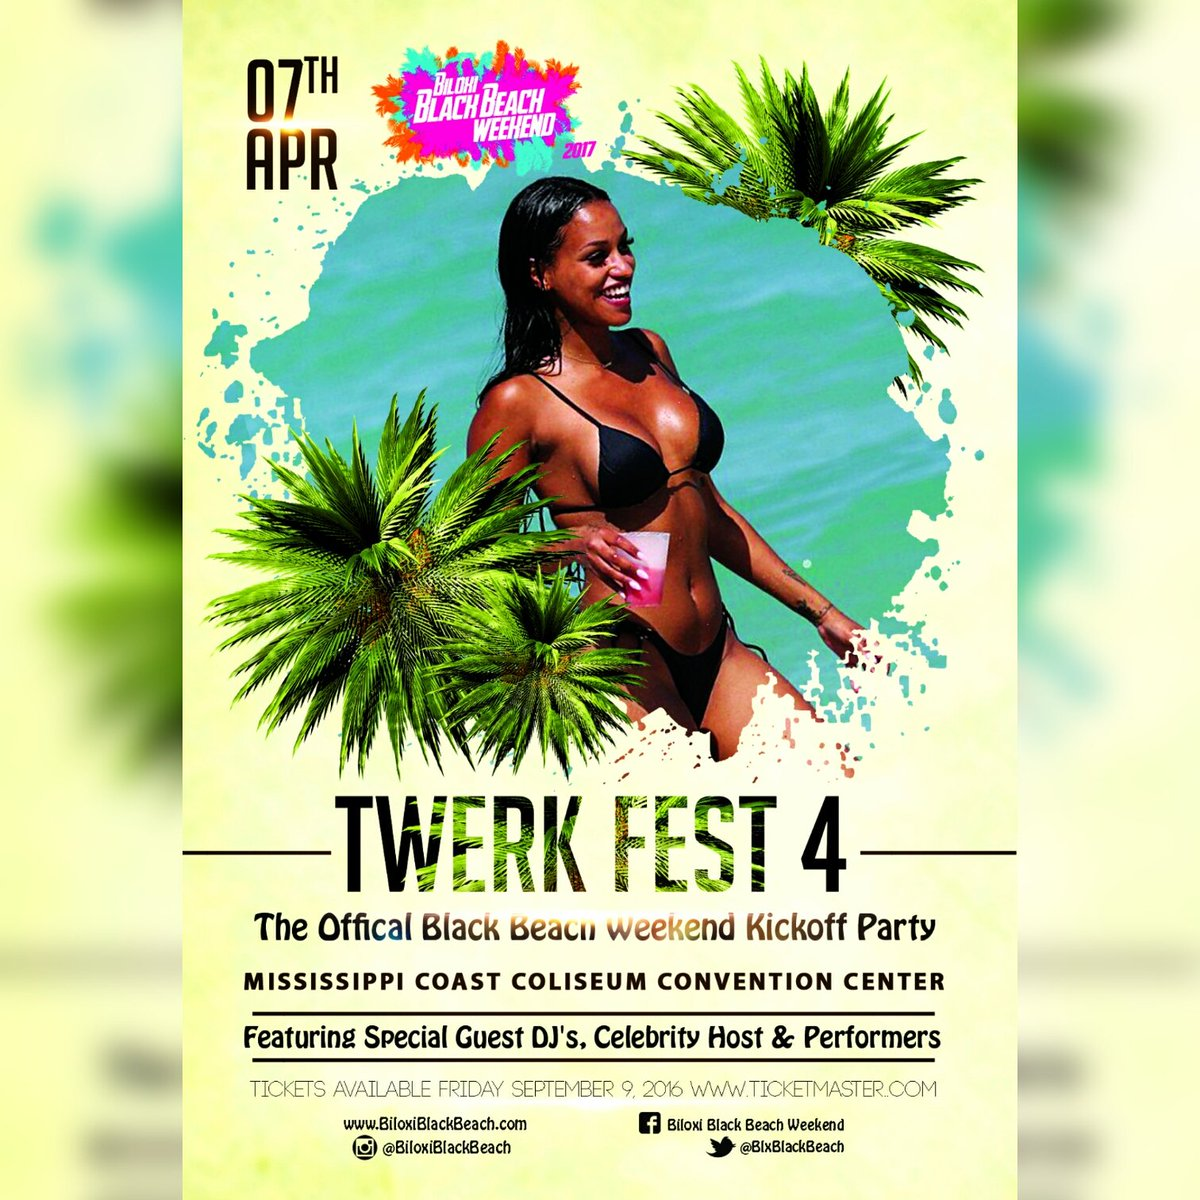 Twerkfest4 Hashtag On Twitter